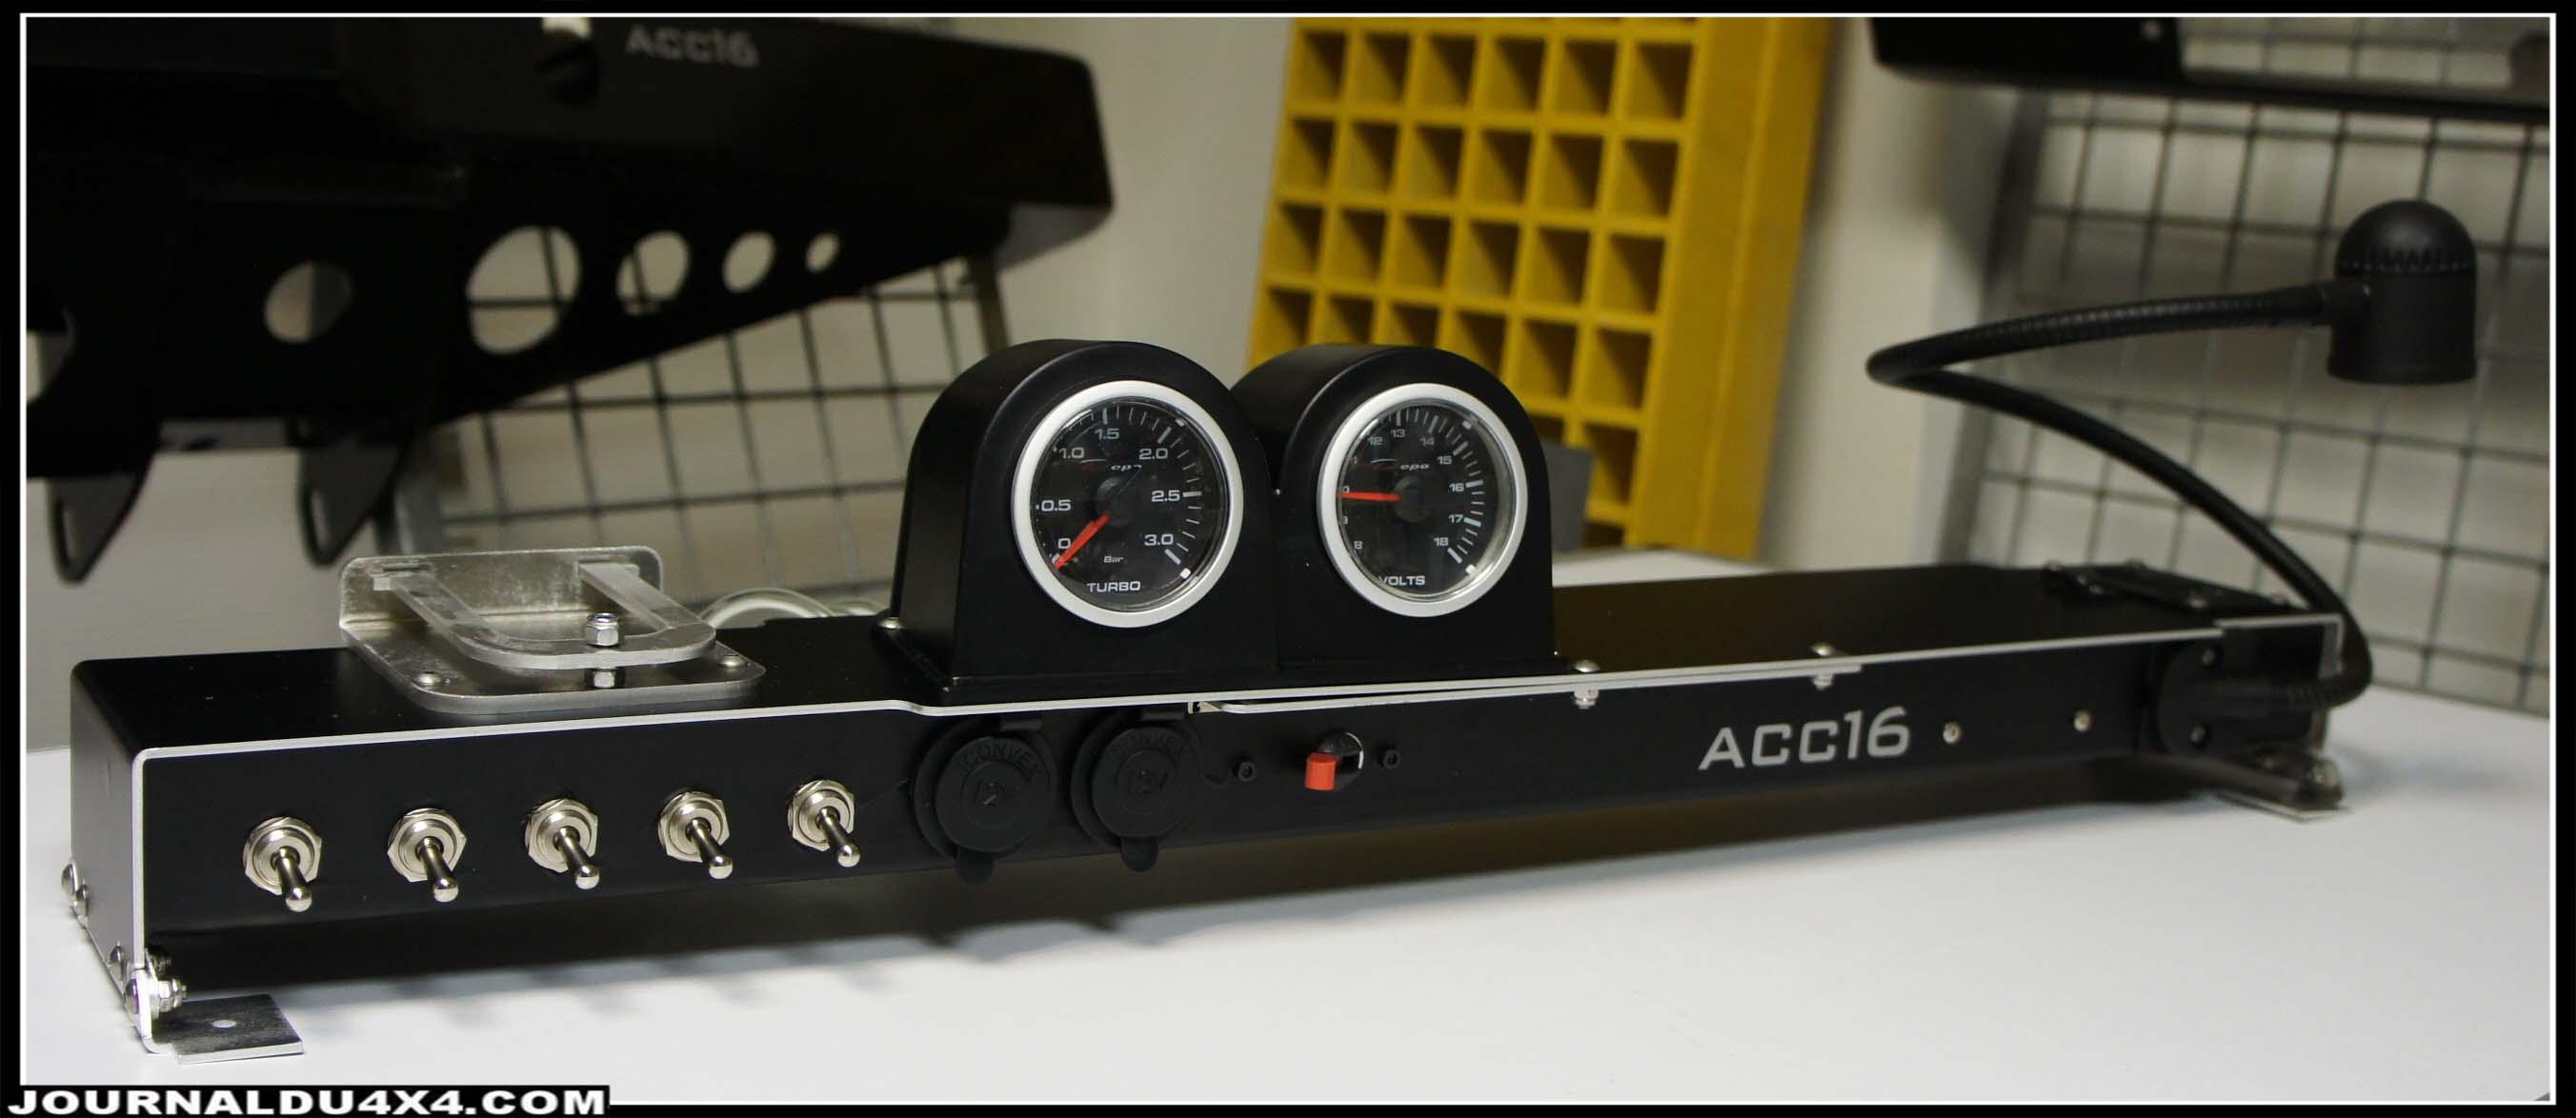 console-acc16.jpg